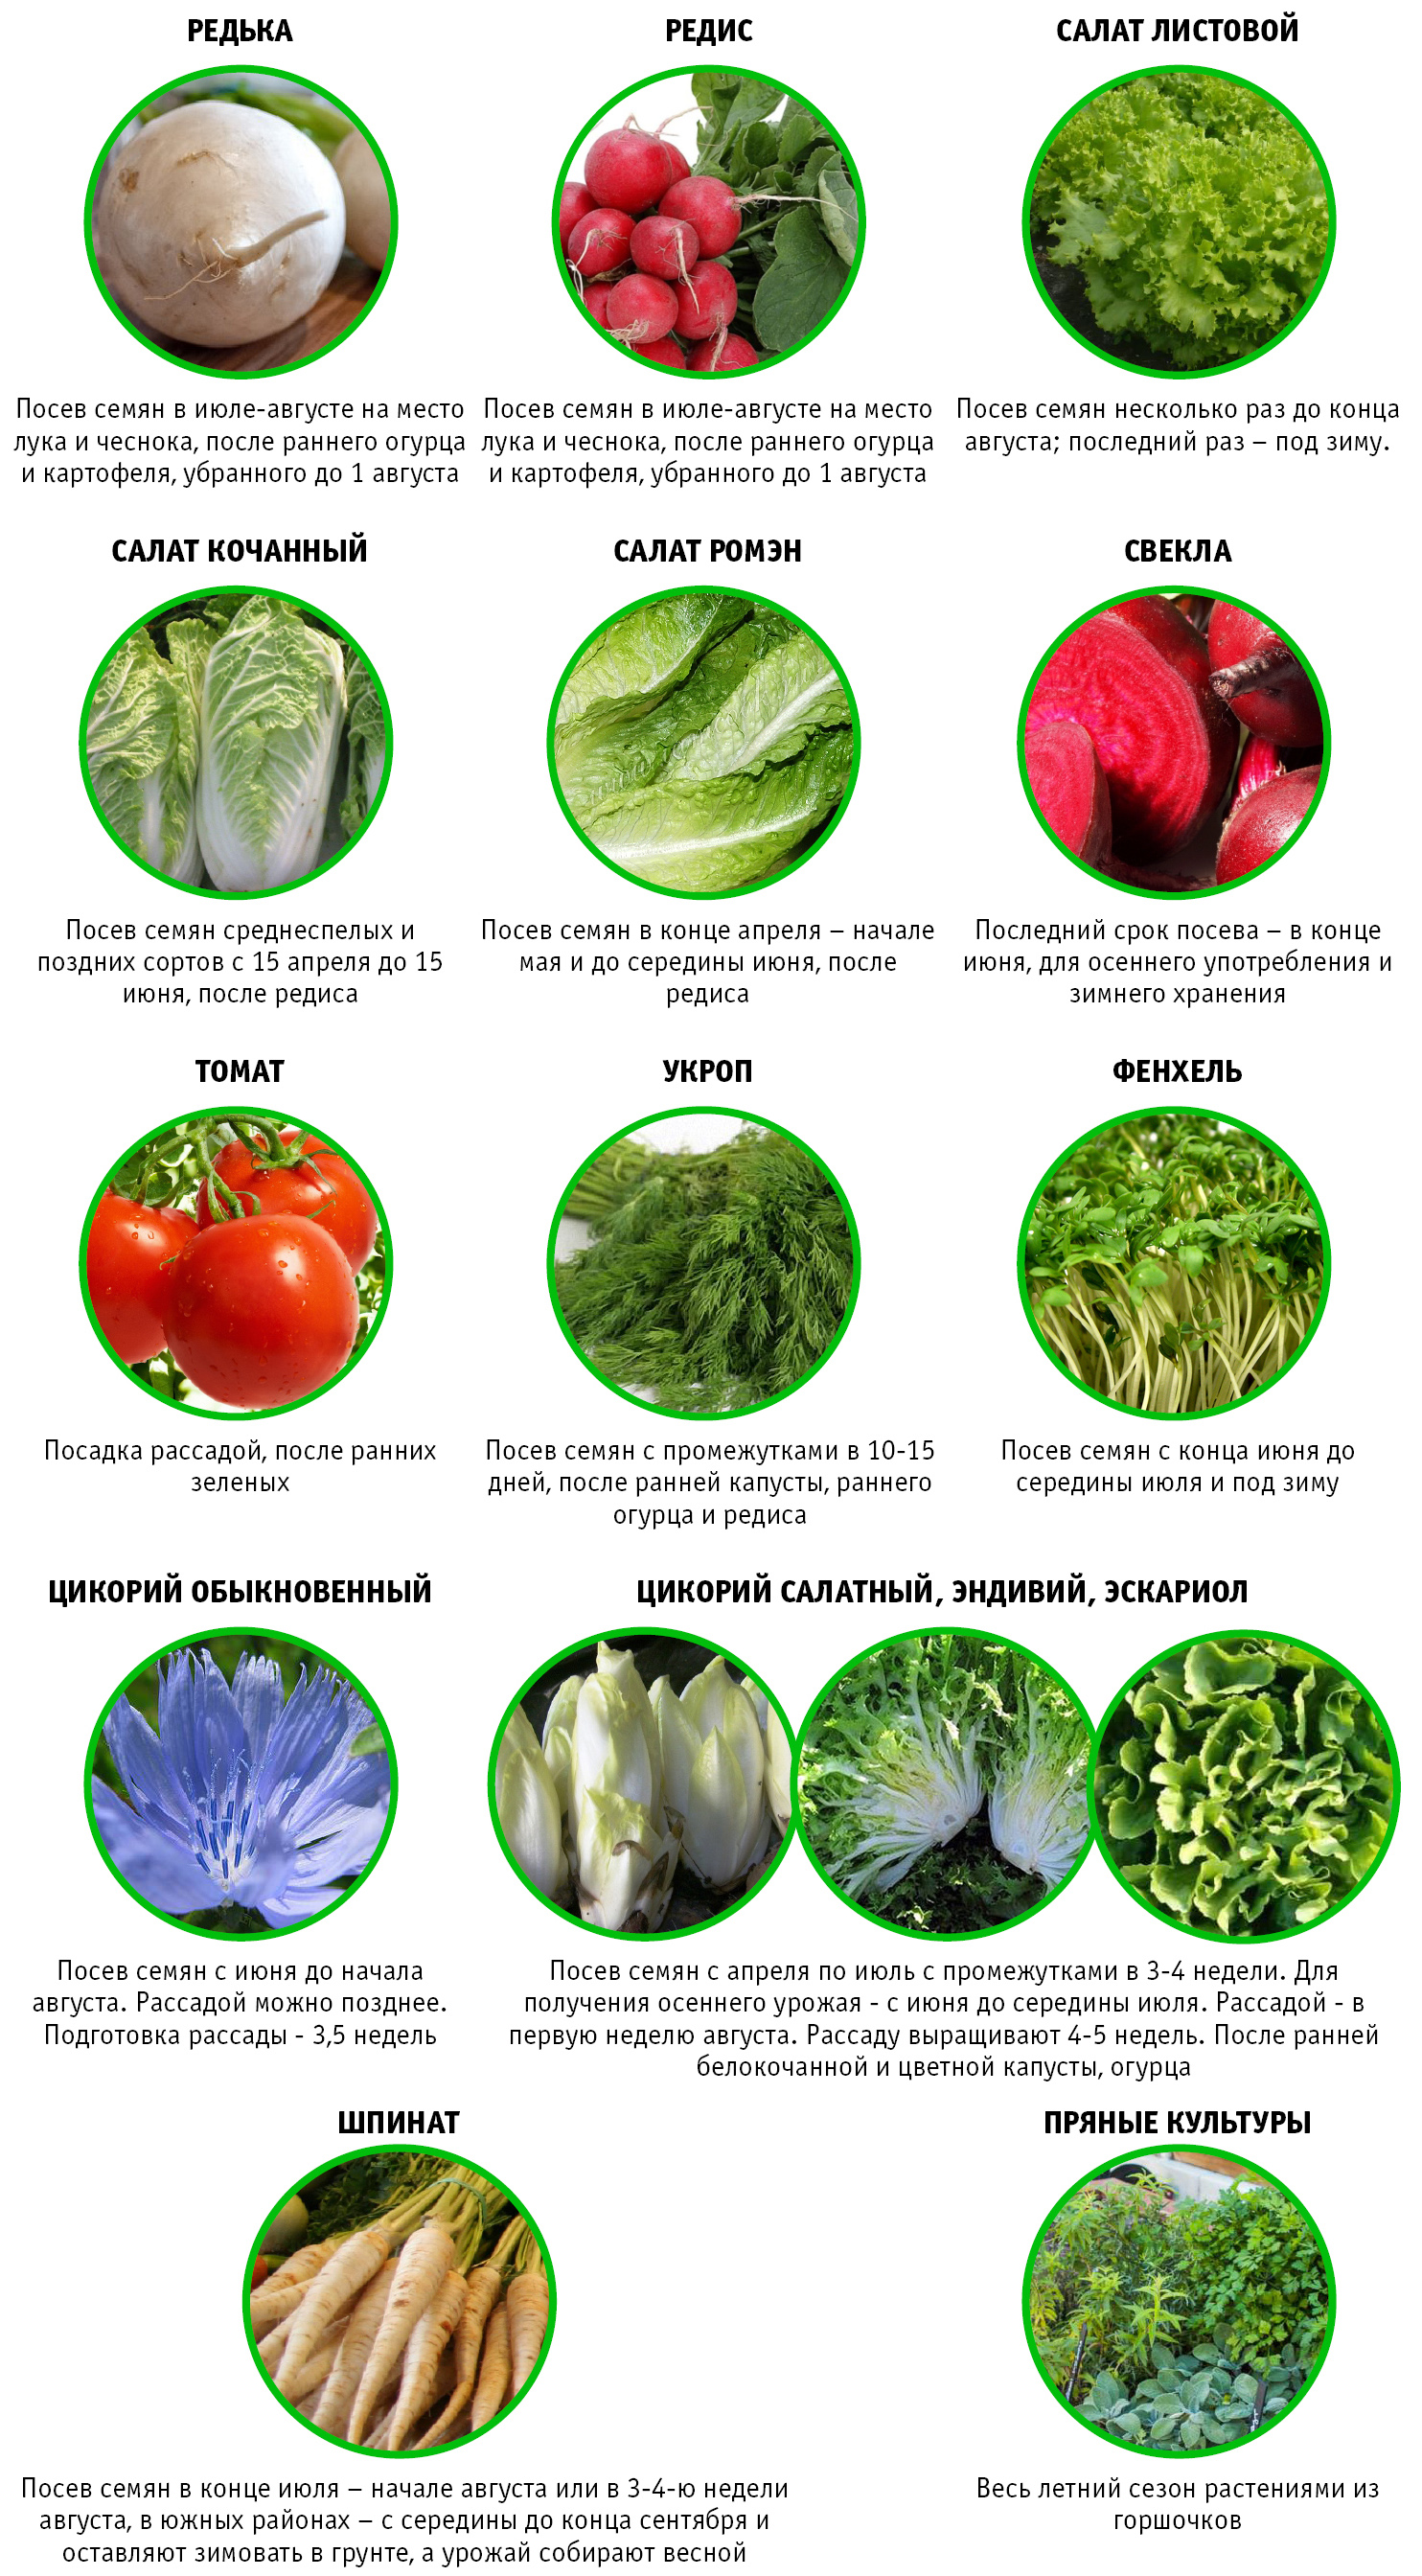 сроки повторной посадки овощей